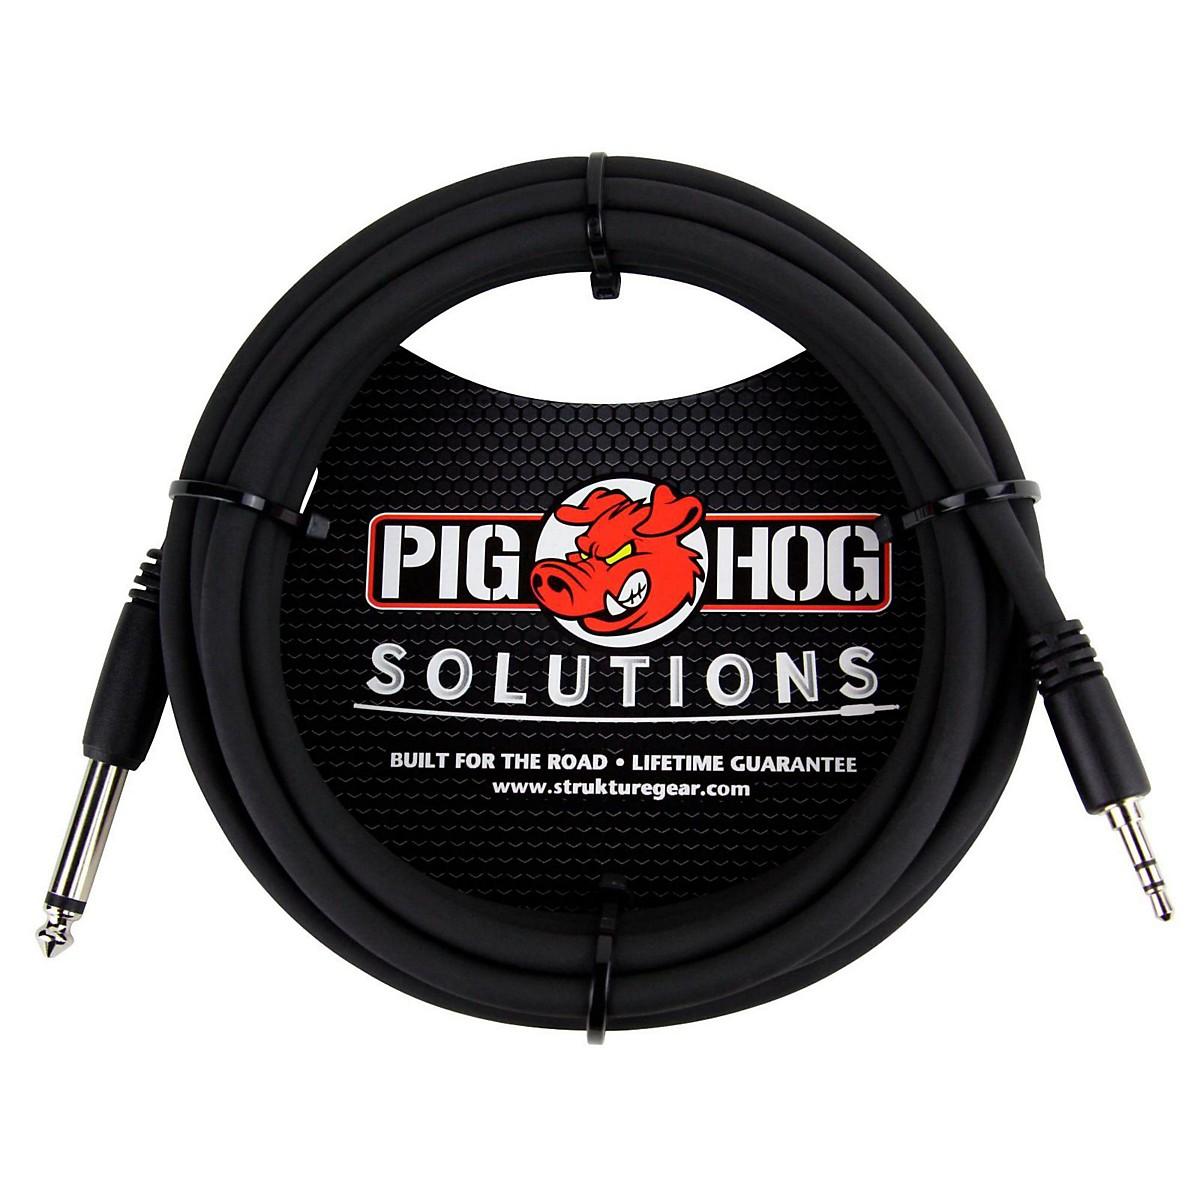 Pig Hog Solutions 3.5mm TRS to 1/4